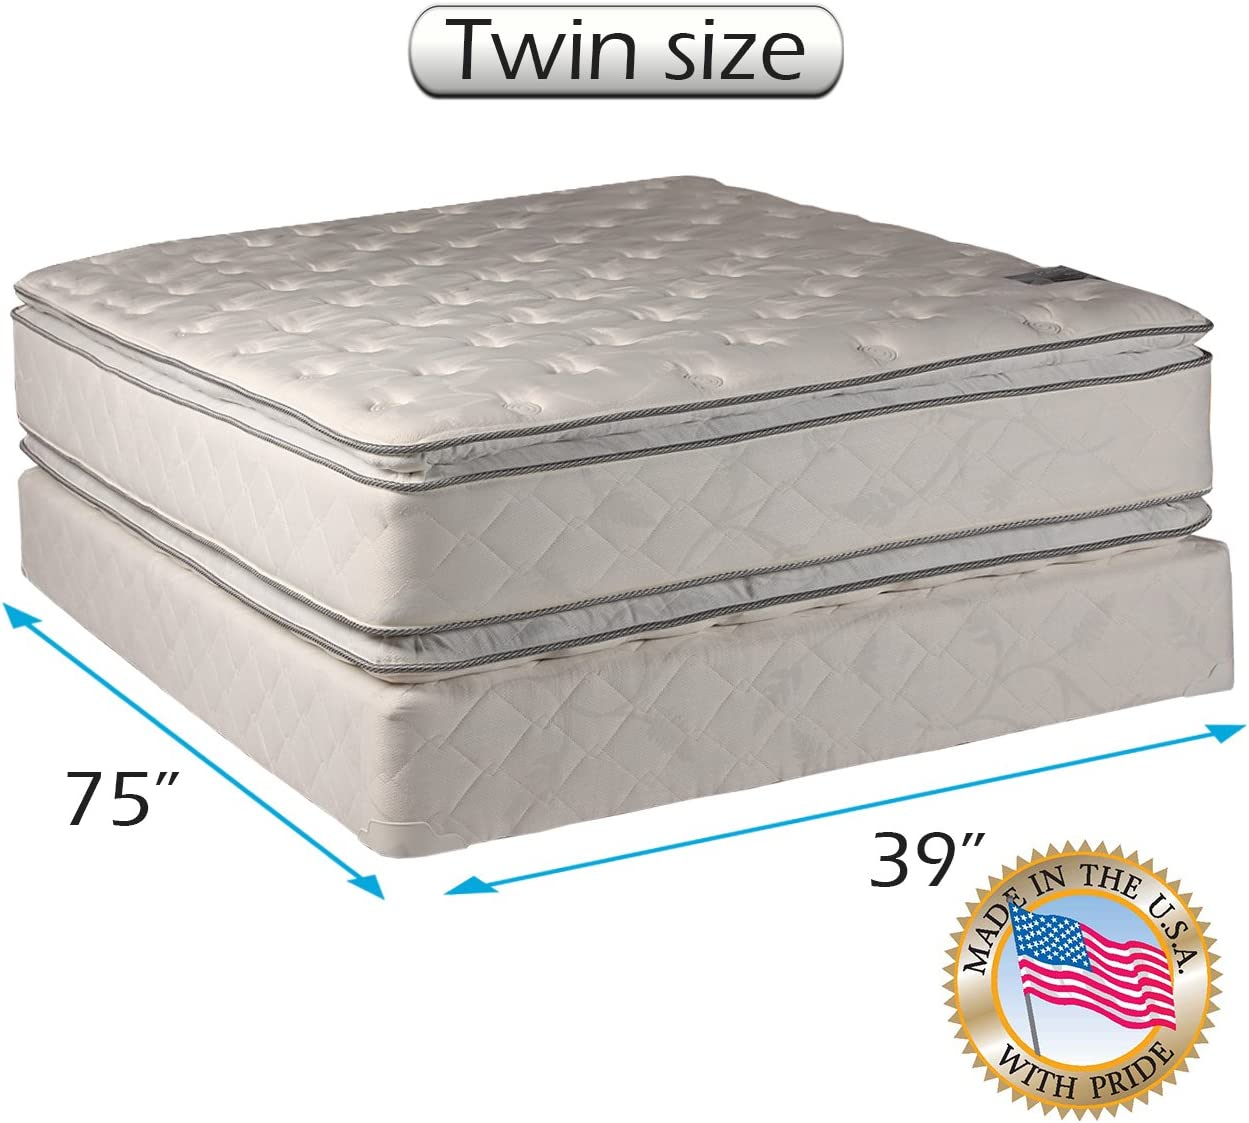 Amazon.com: Serenity Pillow Top (Twin Size) - Mattress and Box